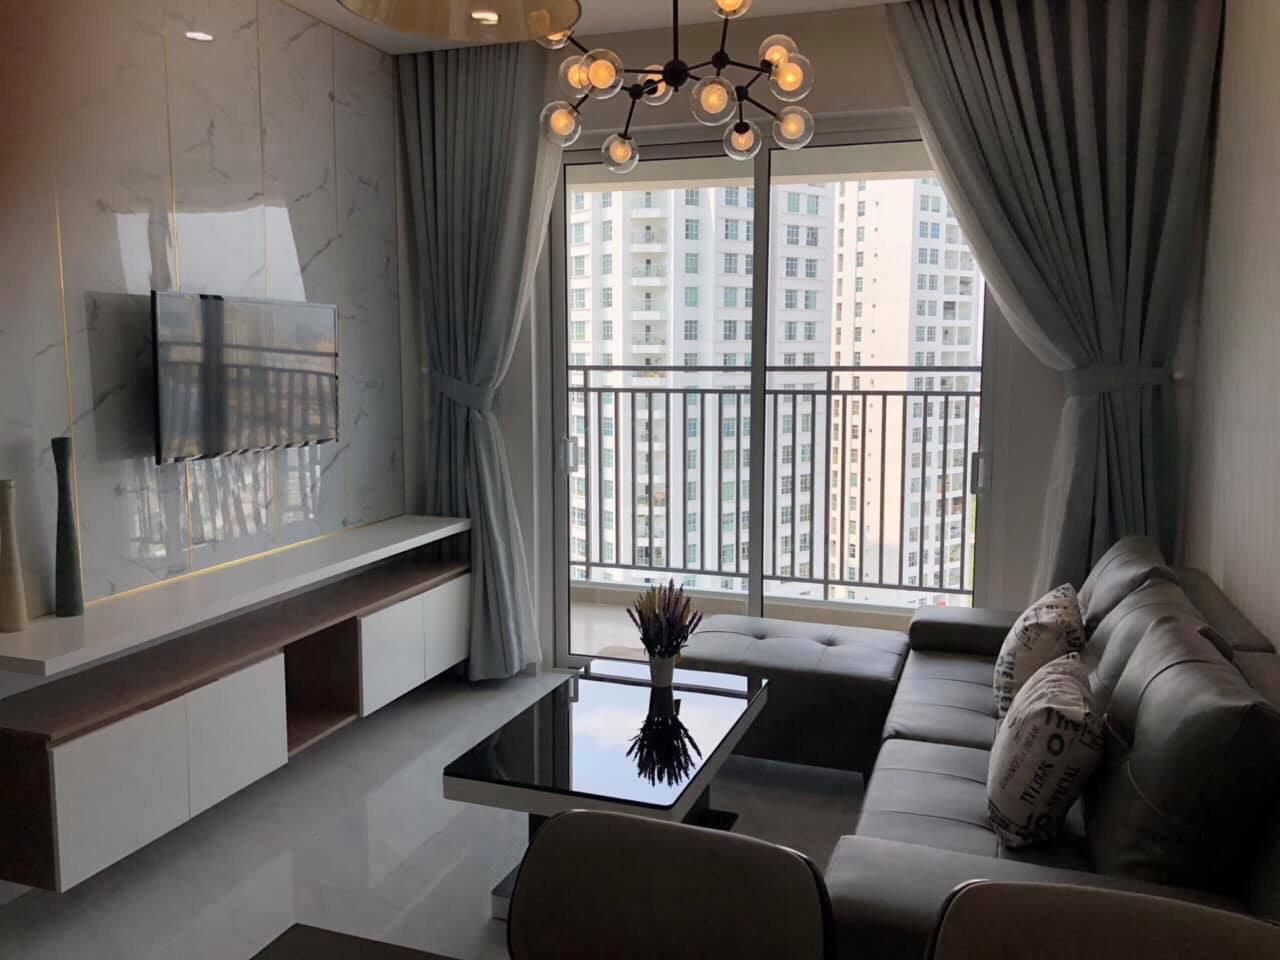 Căn hộ Sunrise Cityview, Tầng Cao, View Đẹp - ID 010006